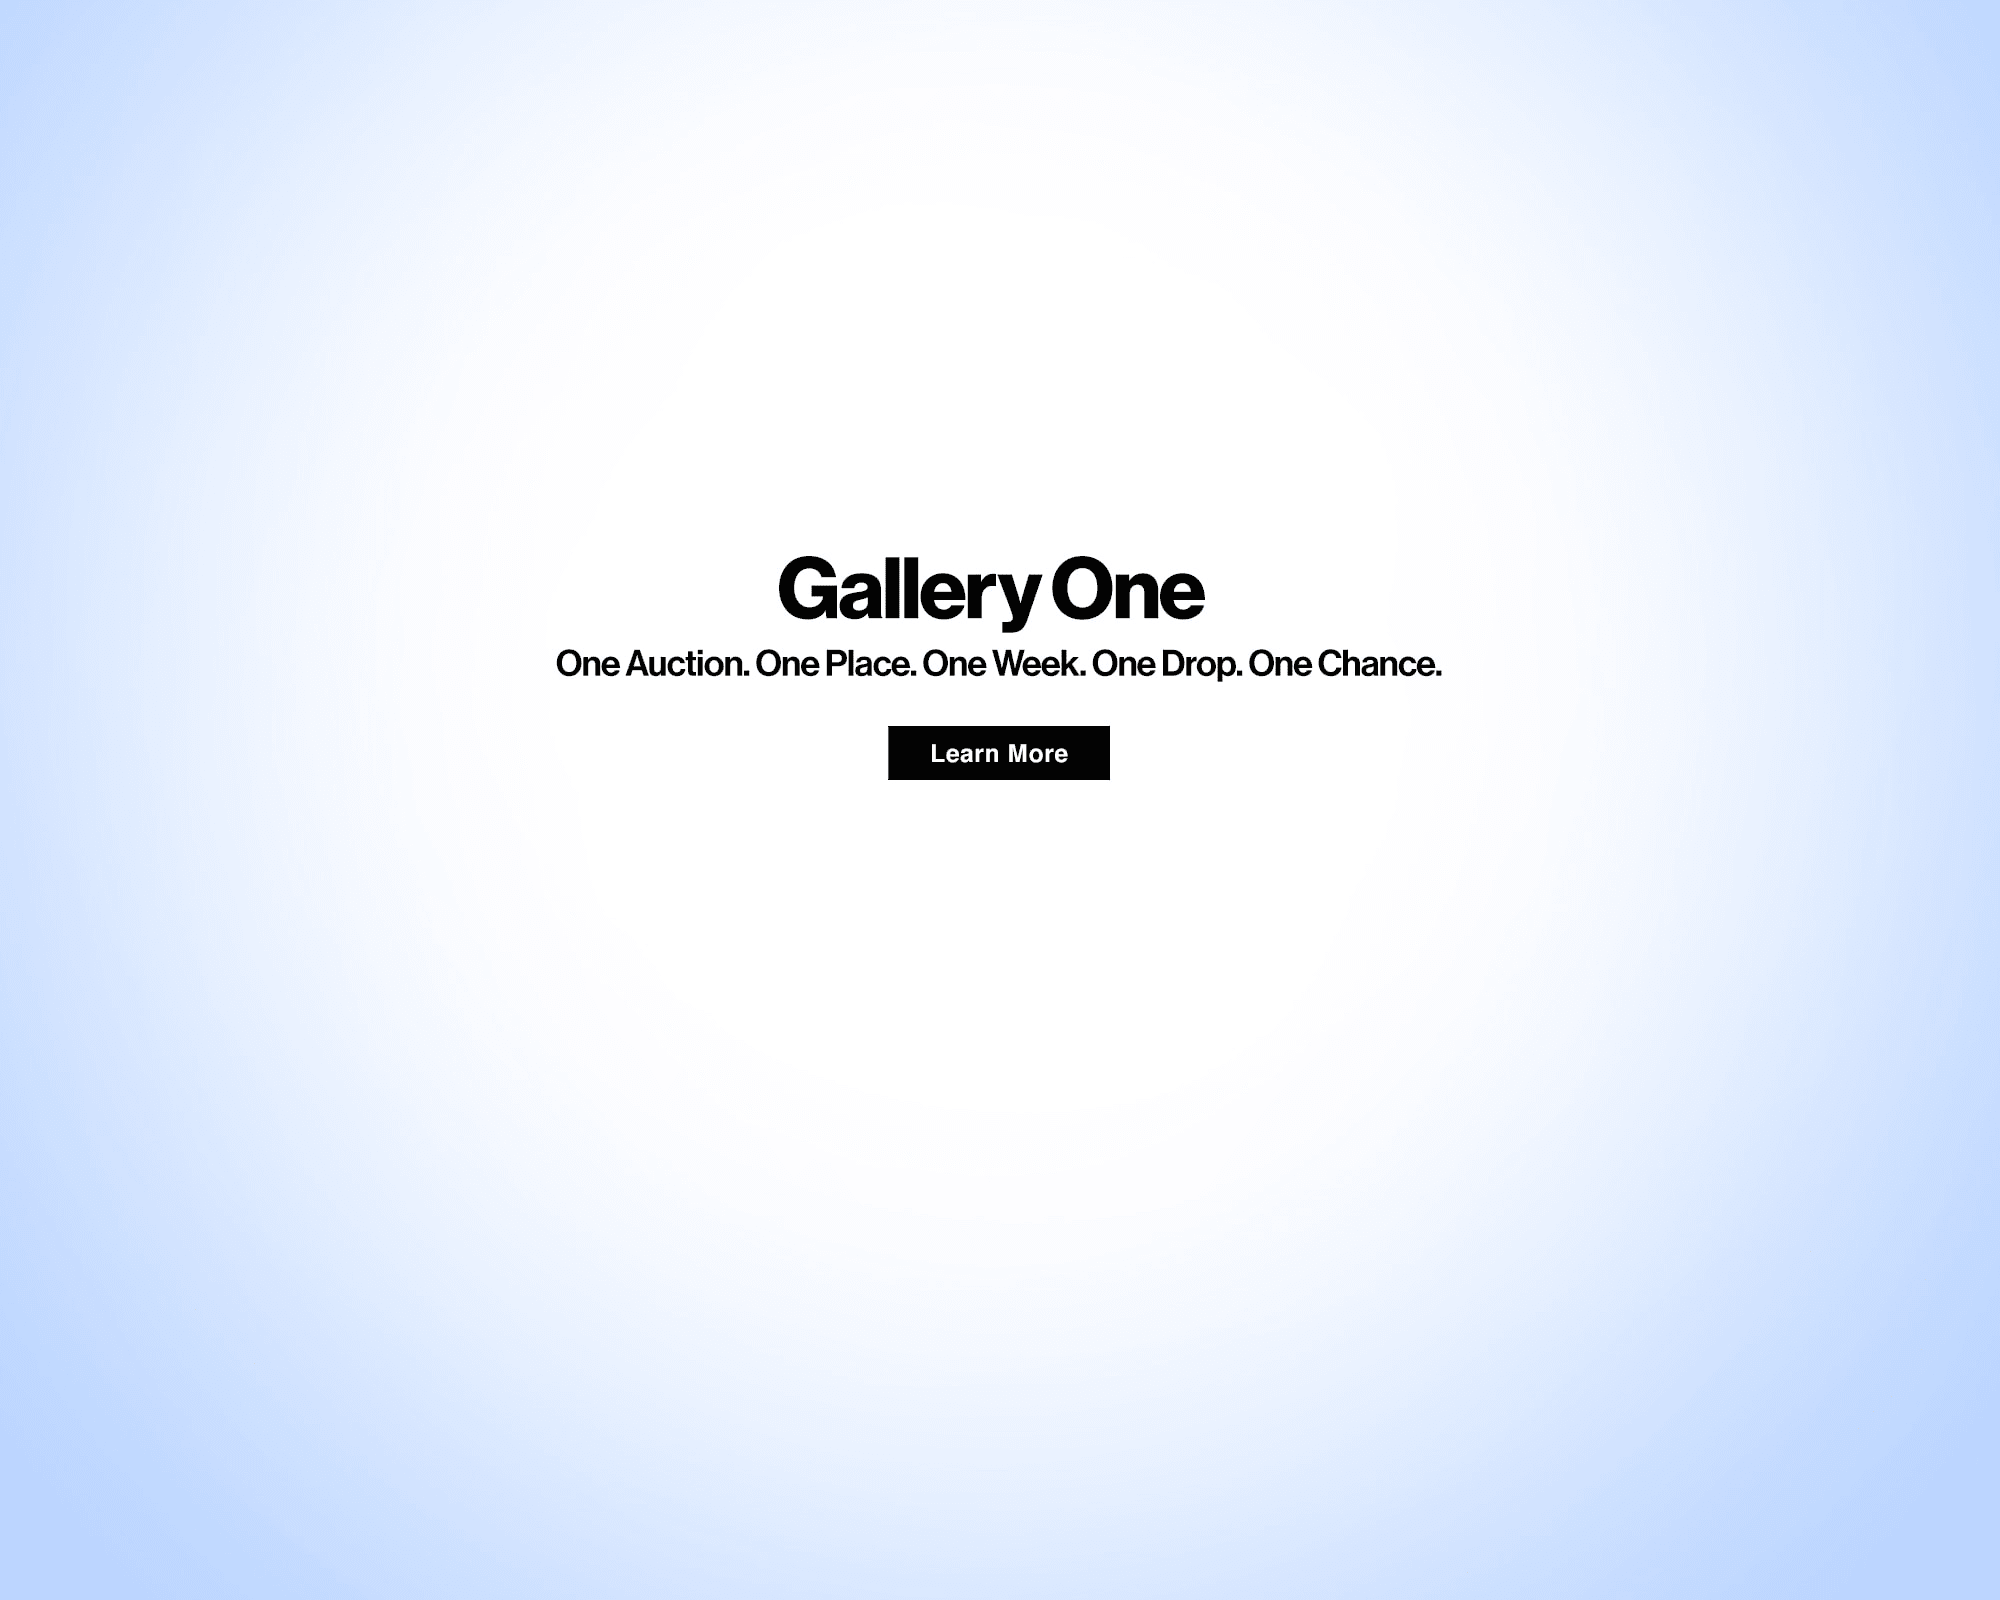 https://www.phillips.com/galleryone/new-york